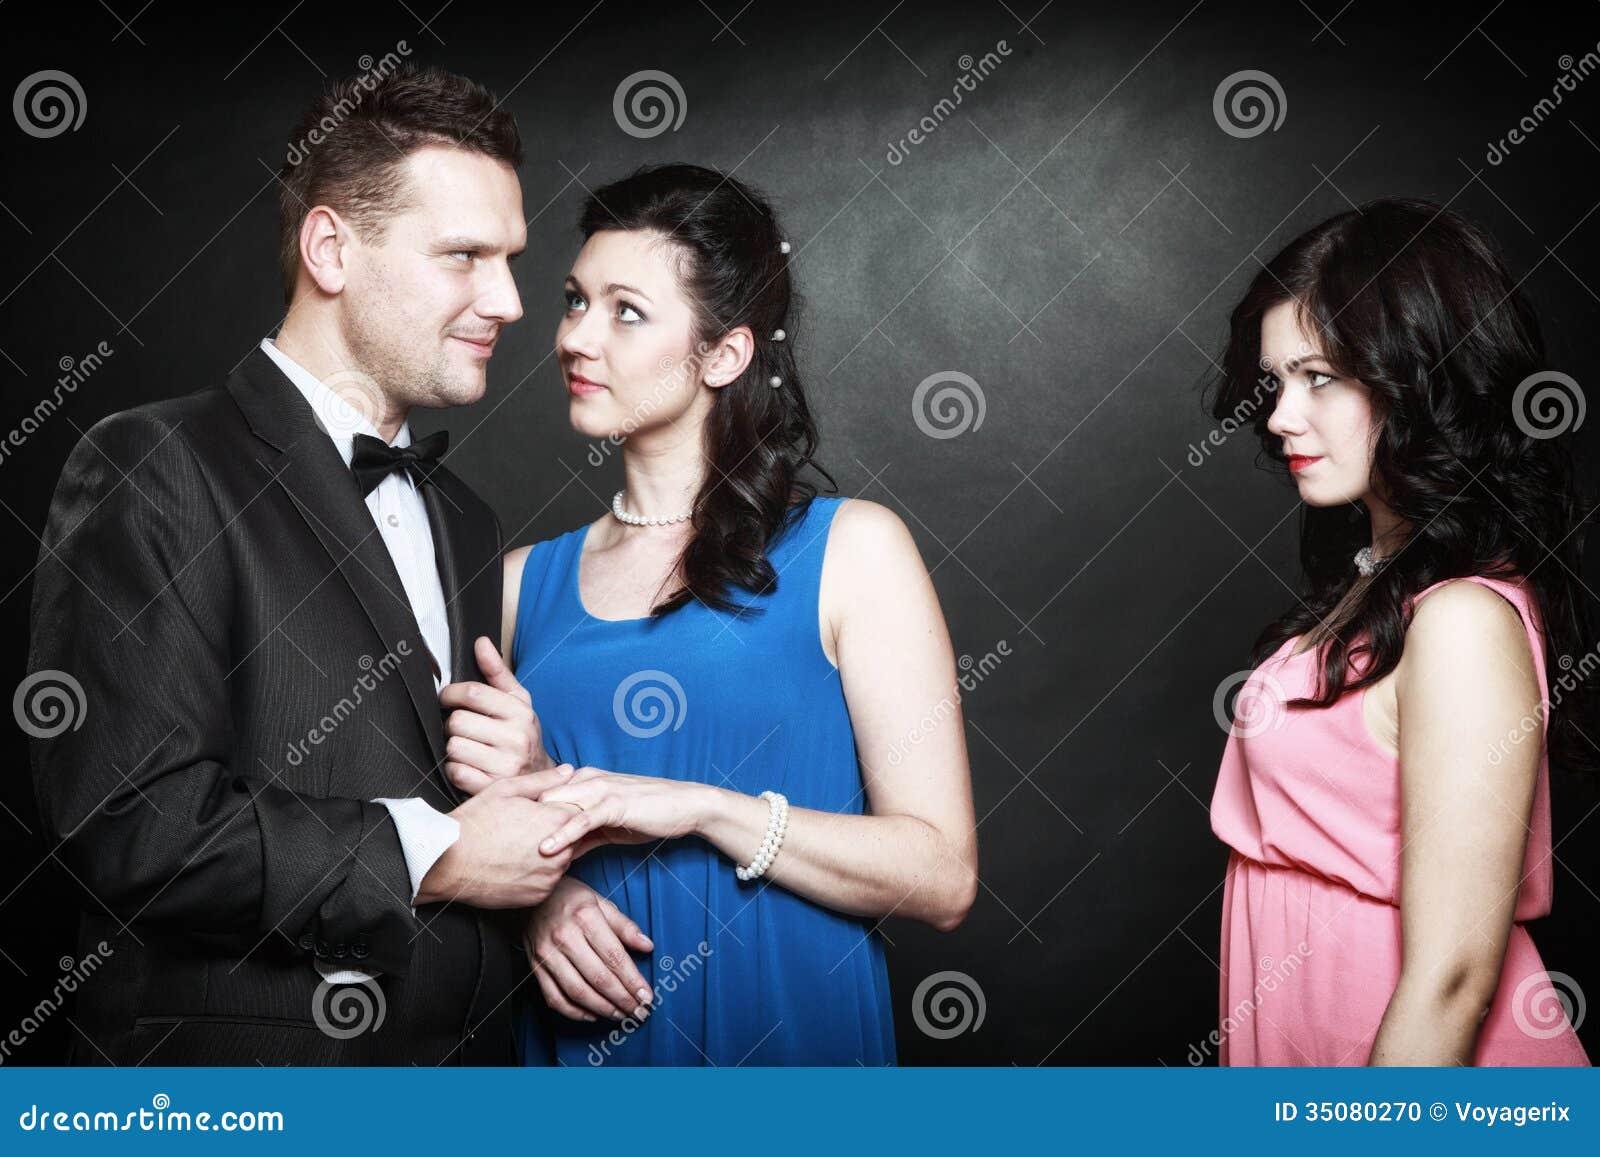 Authoritative 2 males one female threesome